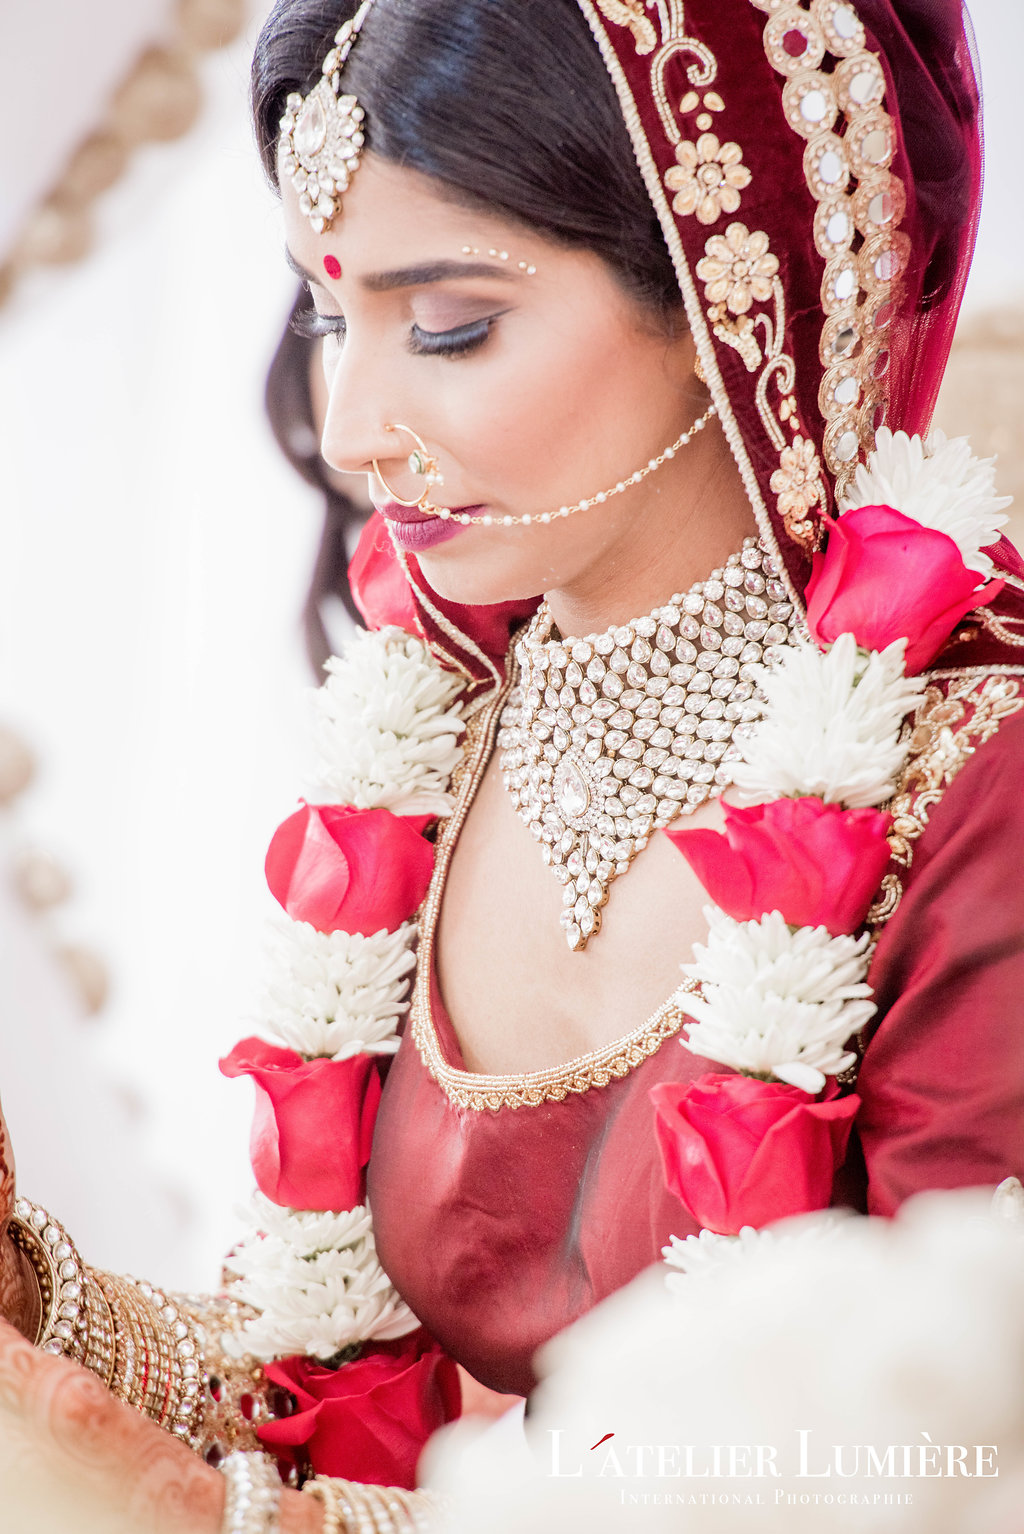 529WED-Nidhi&Tushar-EX-MR-WMLL5_6518